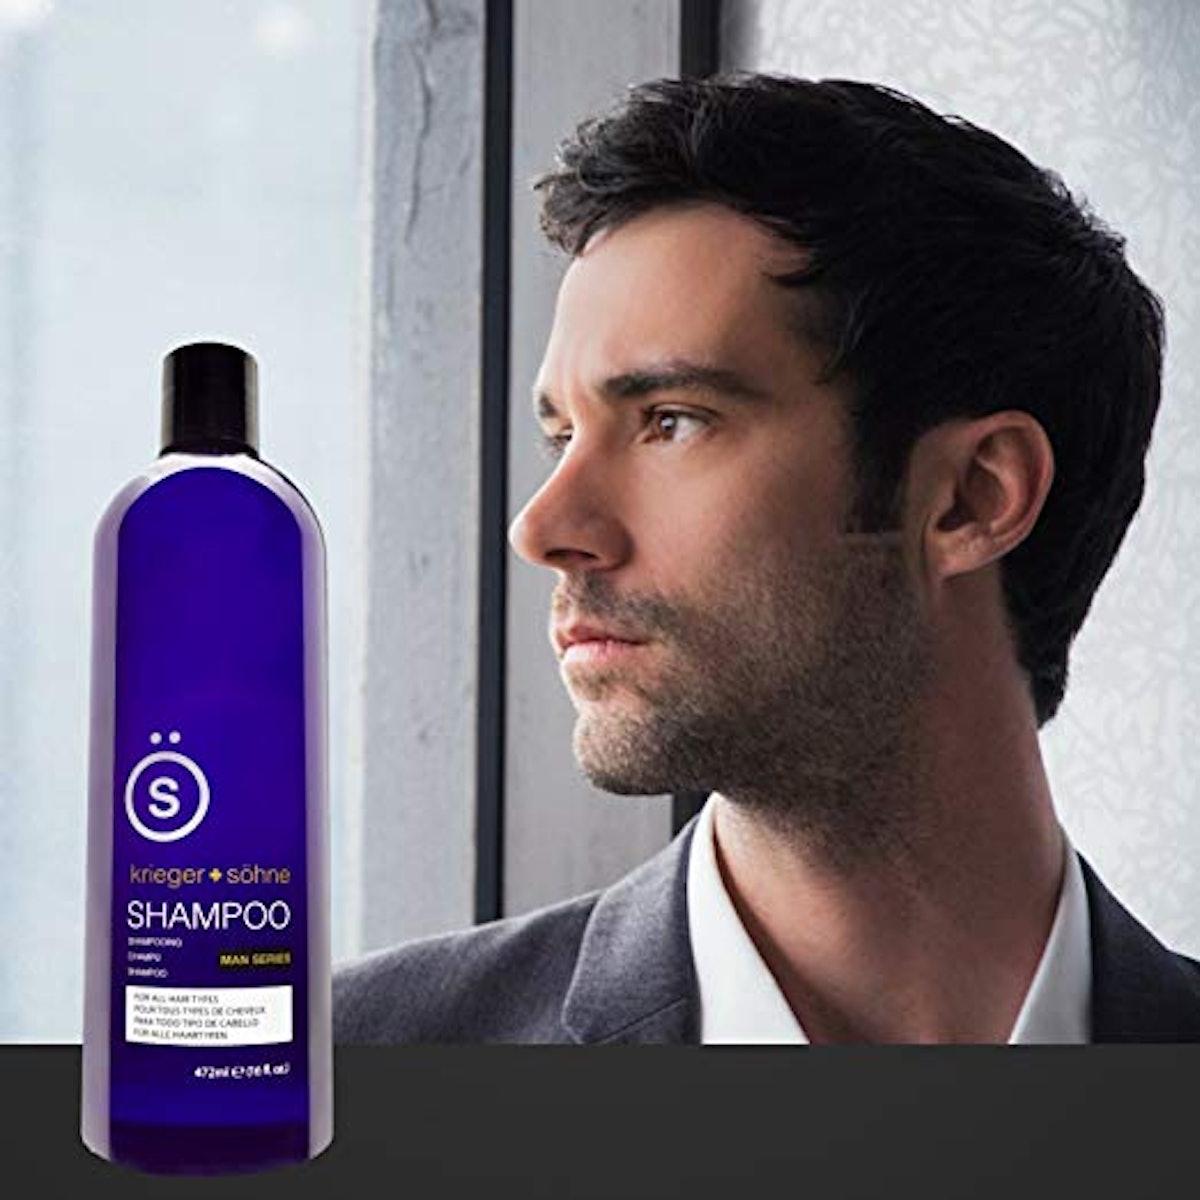 Krieger + Söhne Shampoo For Men